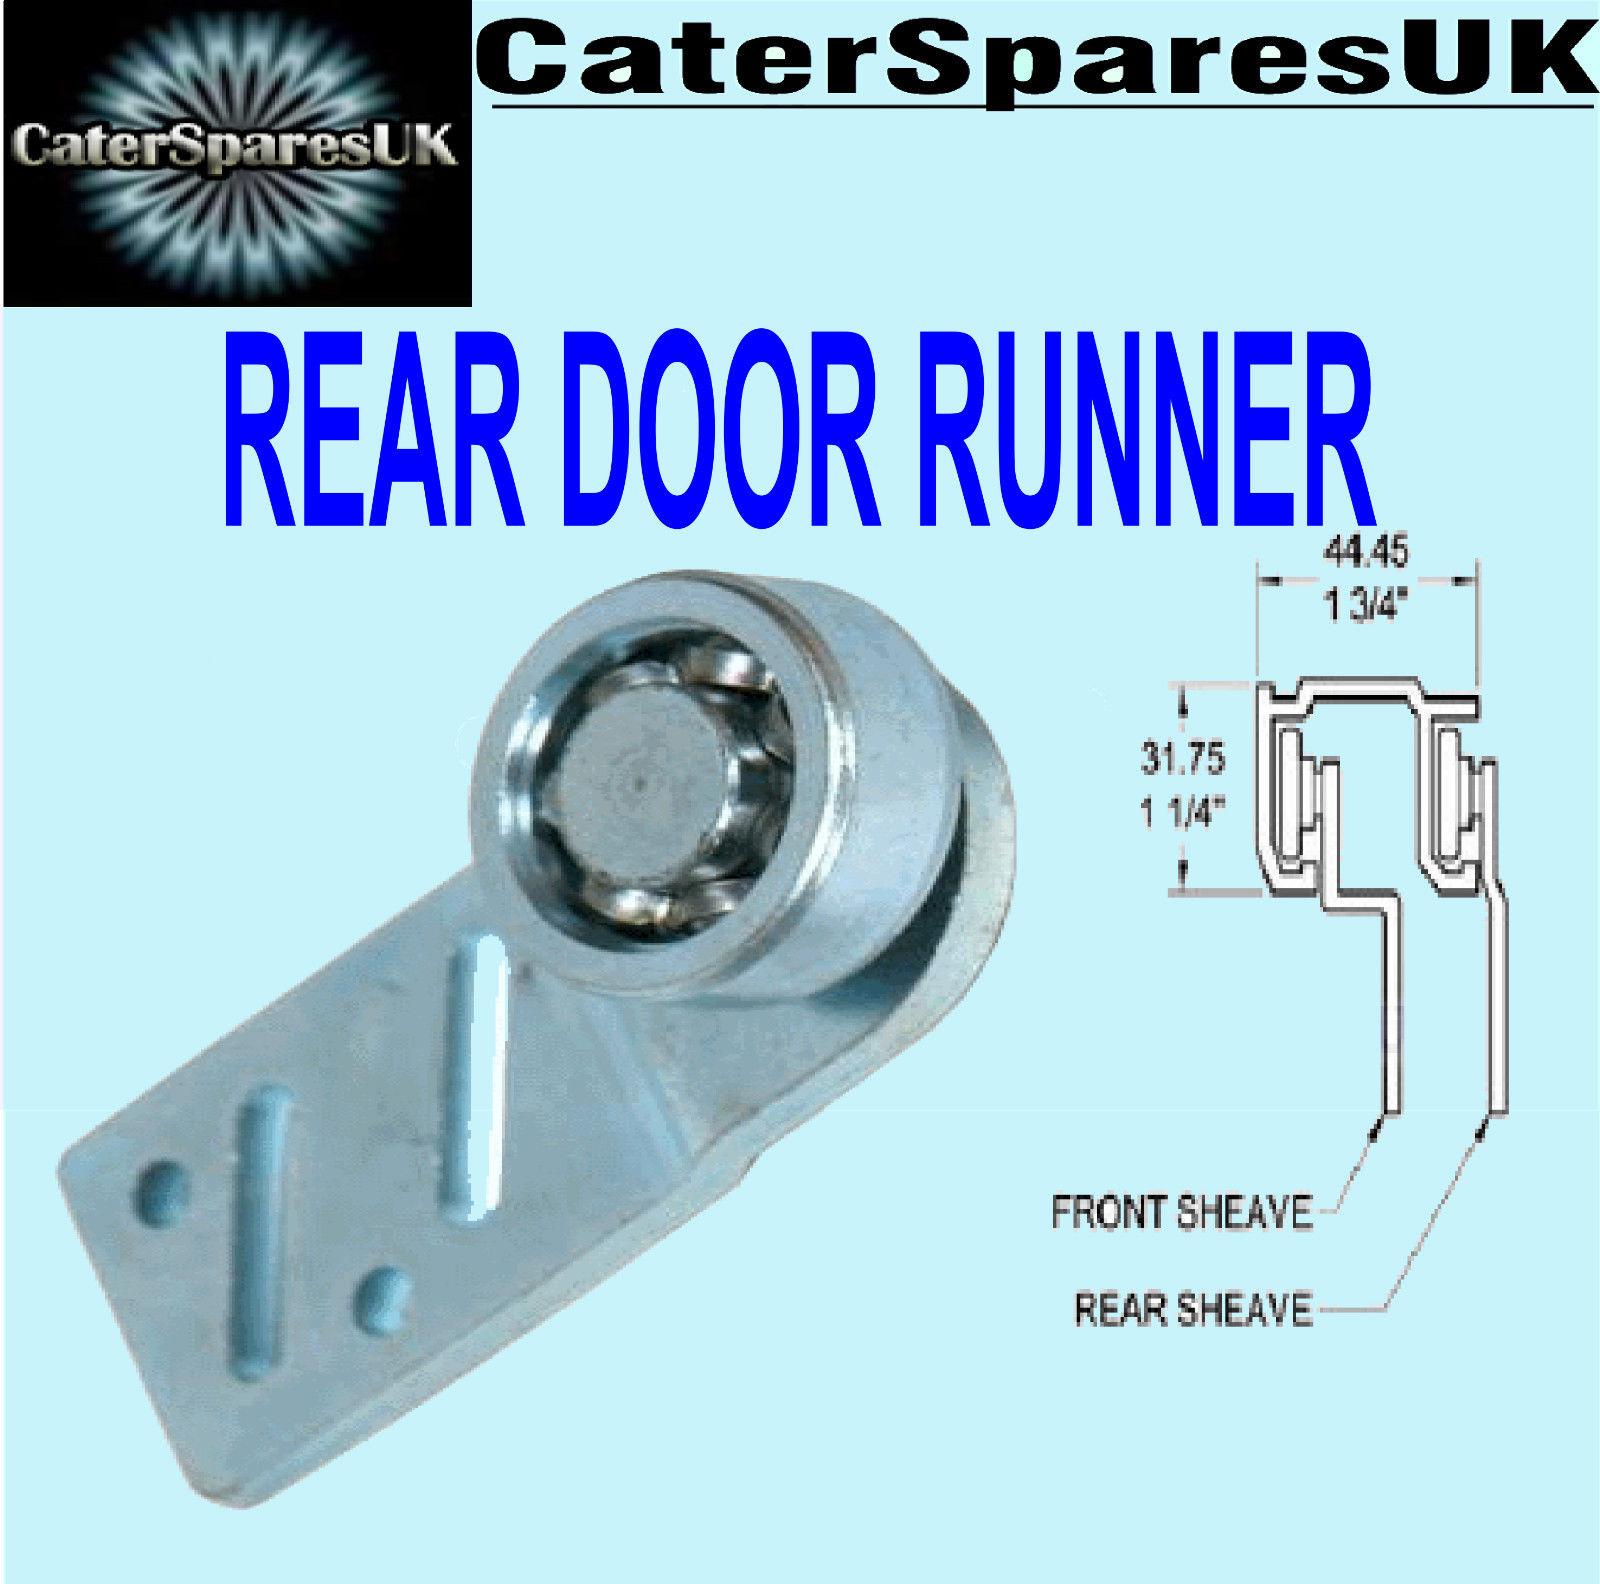 Hot Cupboard Straight Rear Sliding Door Runner Bearing Hanger Cater